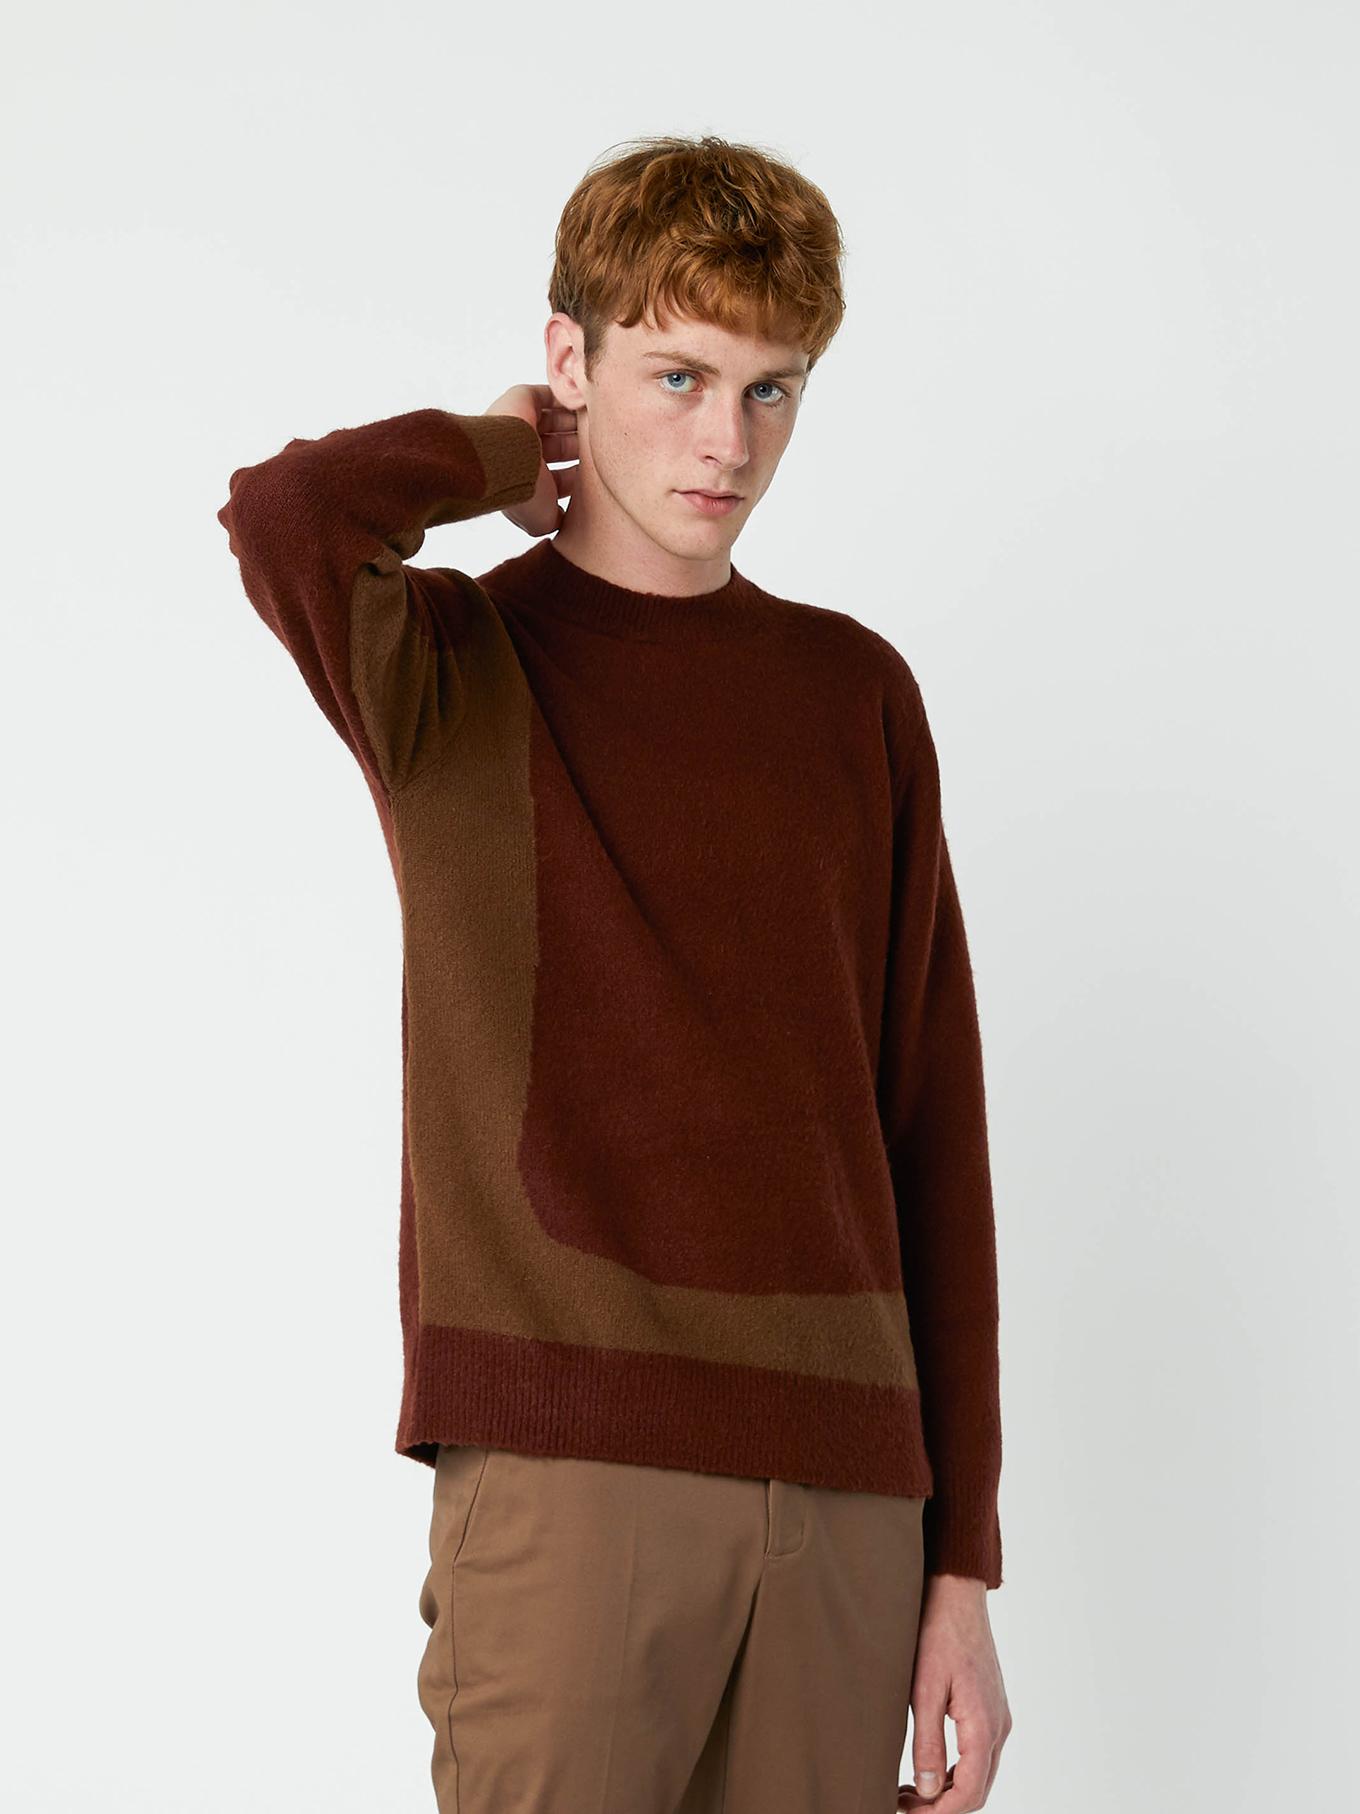 Mens longsleeve sweater basic casual everyday clothing